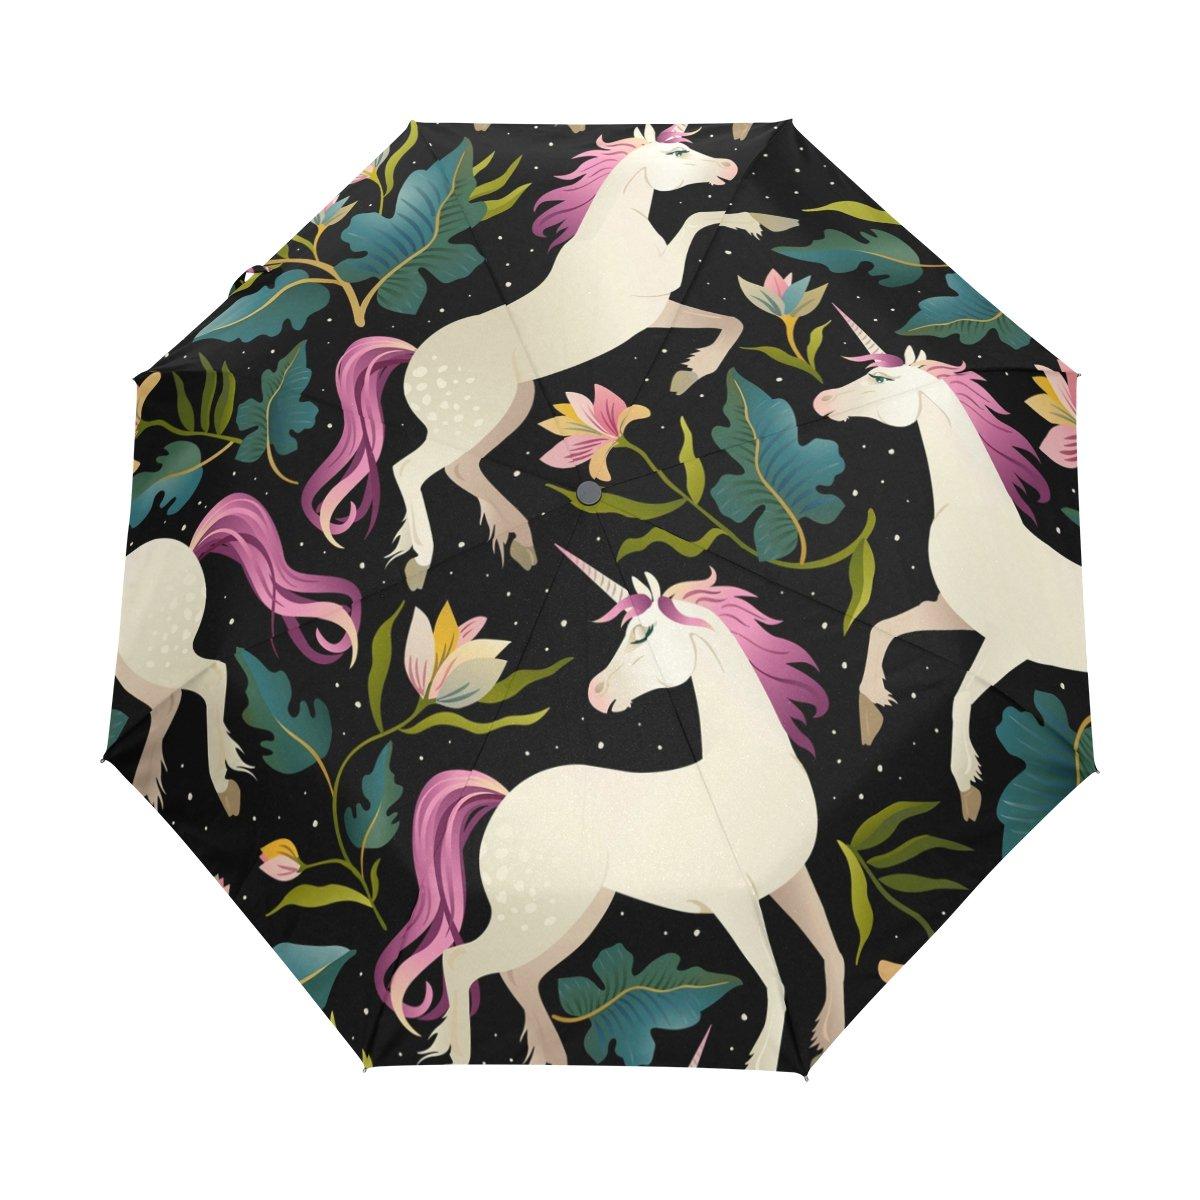 Senya Saobao防風と防雨トラベル傘with自動開いて閉じFolding美しいUnicornsポータブル折りたたみ式太陽雨傘 B07FDZ4ML8